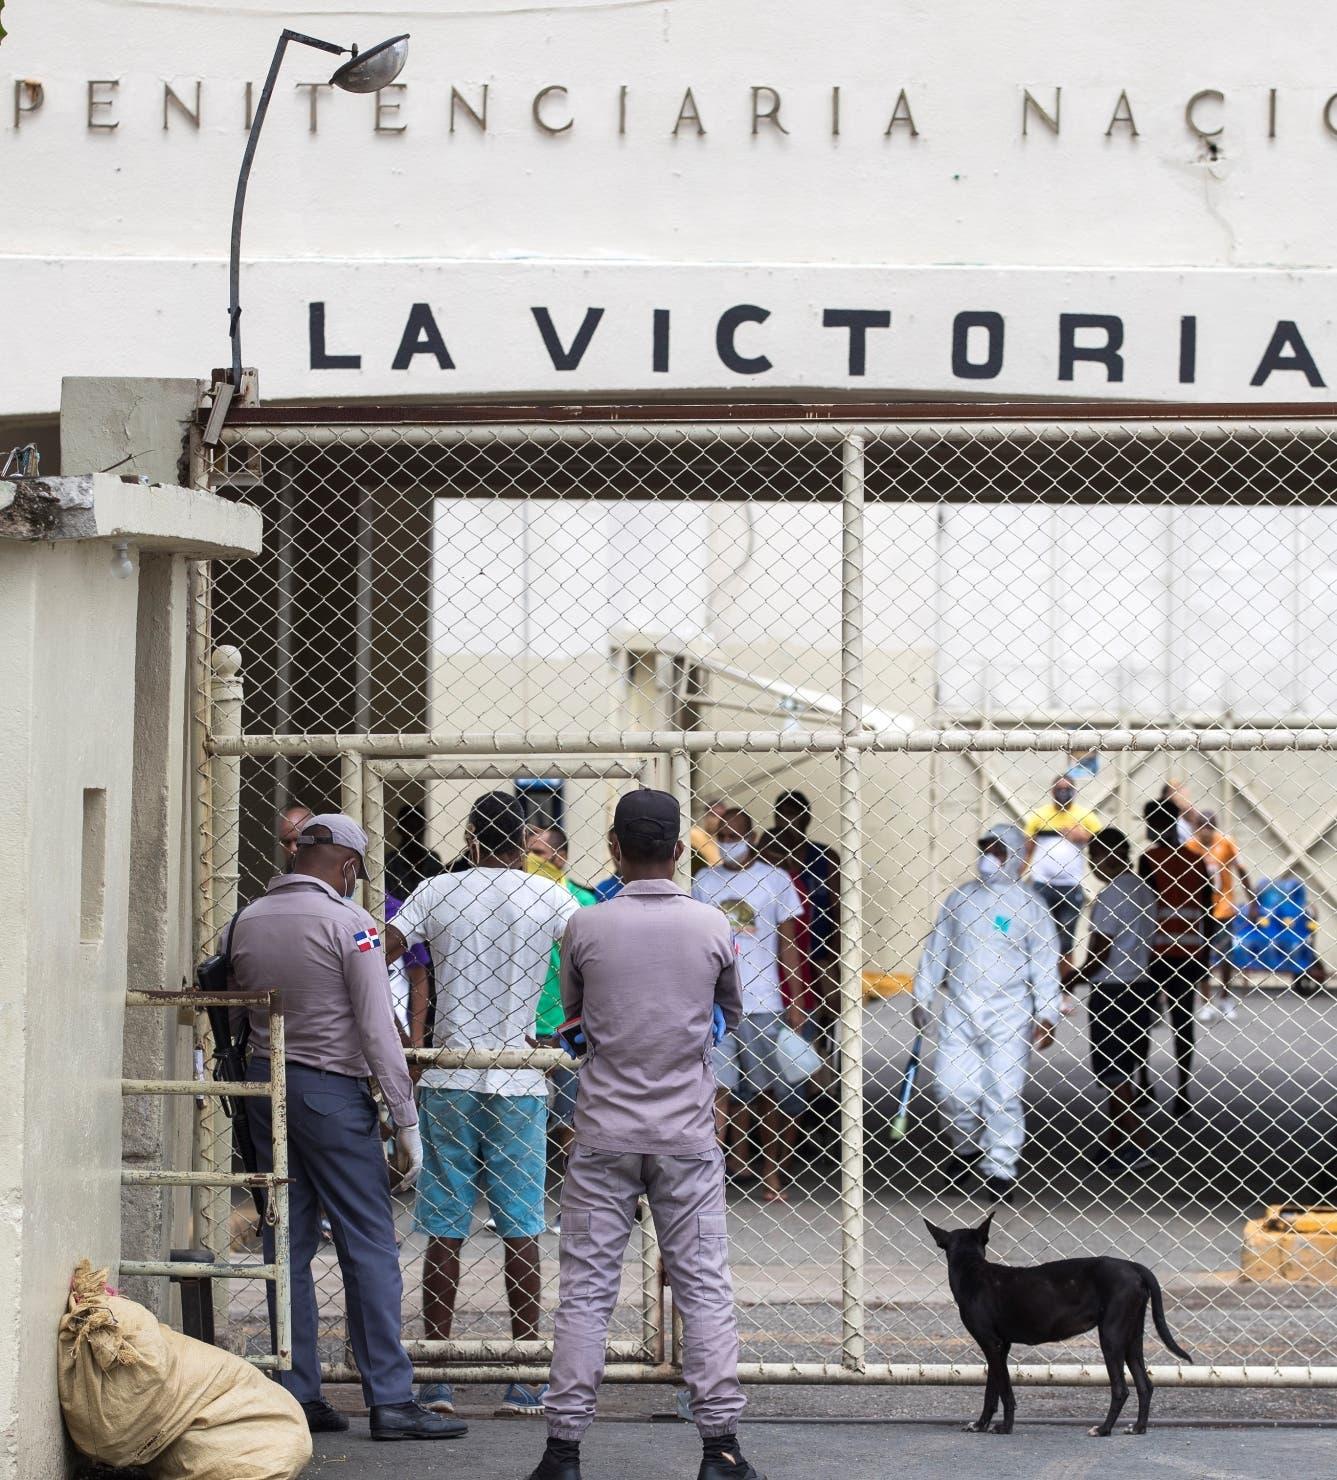 Abogados podrán visitar presos sin citas previas